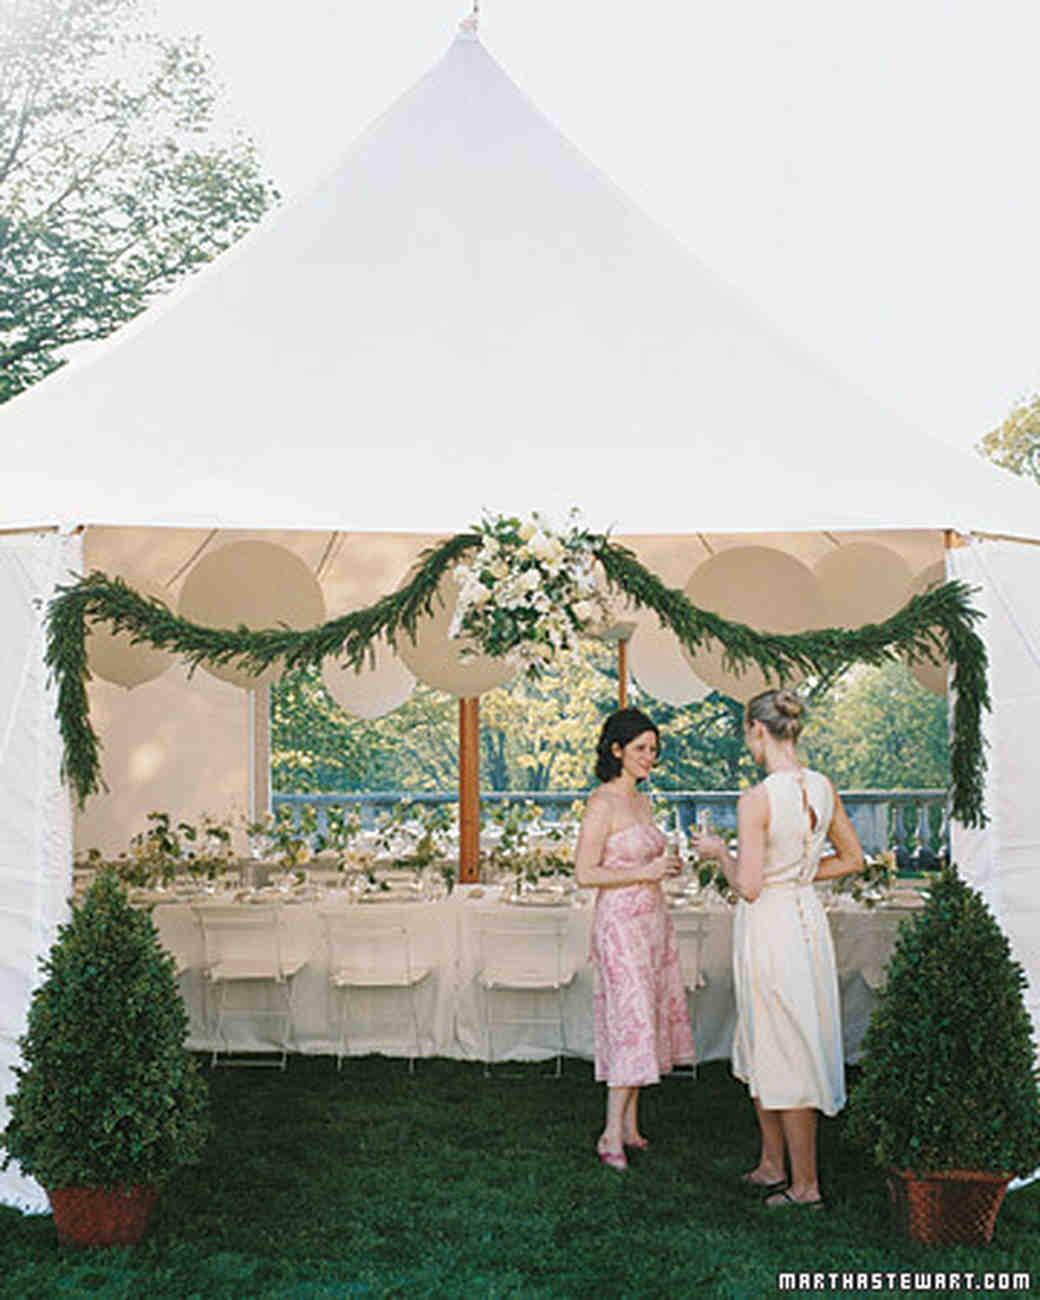 Summer Outdoor Wedding Decorations Ideas 12: Summer Weddings: An Outdoor Occasion